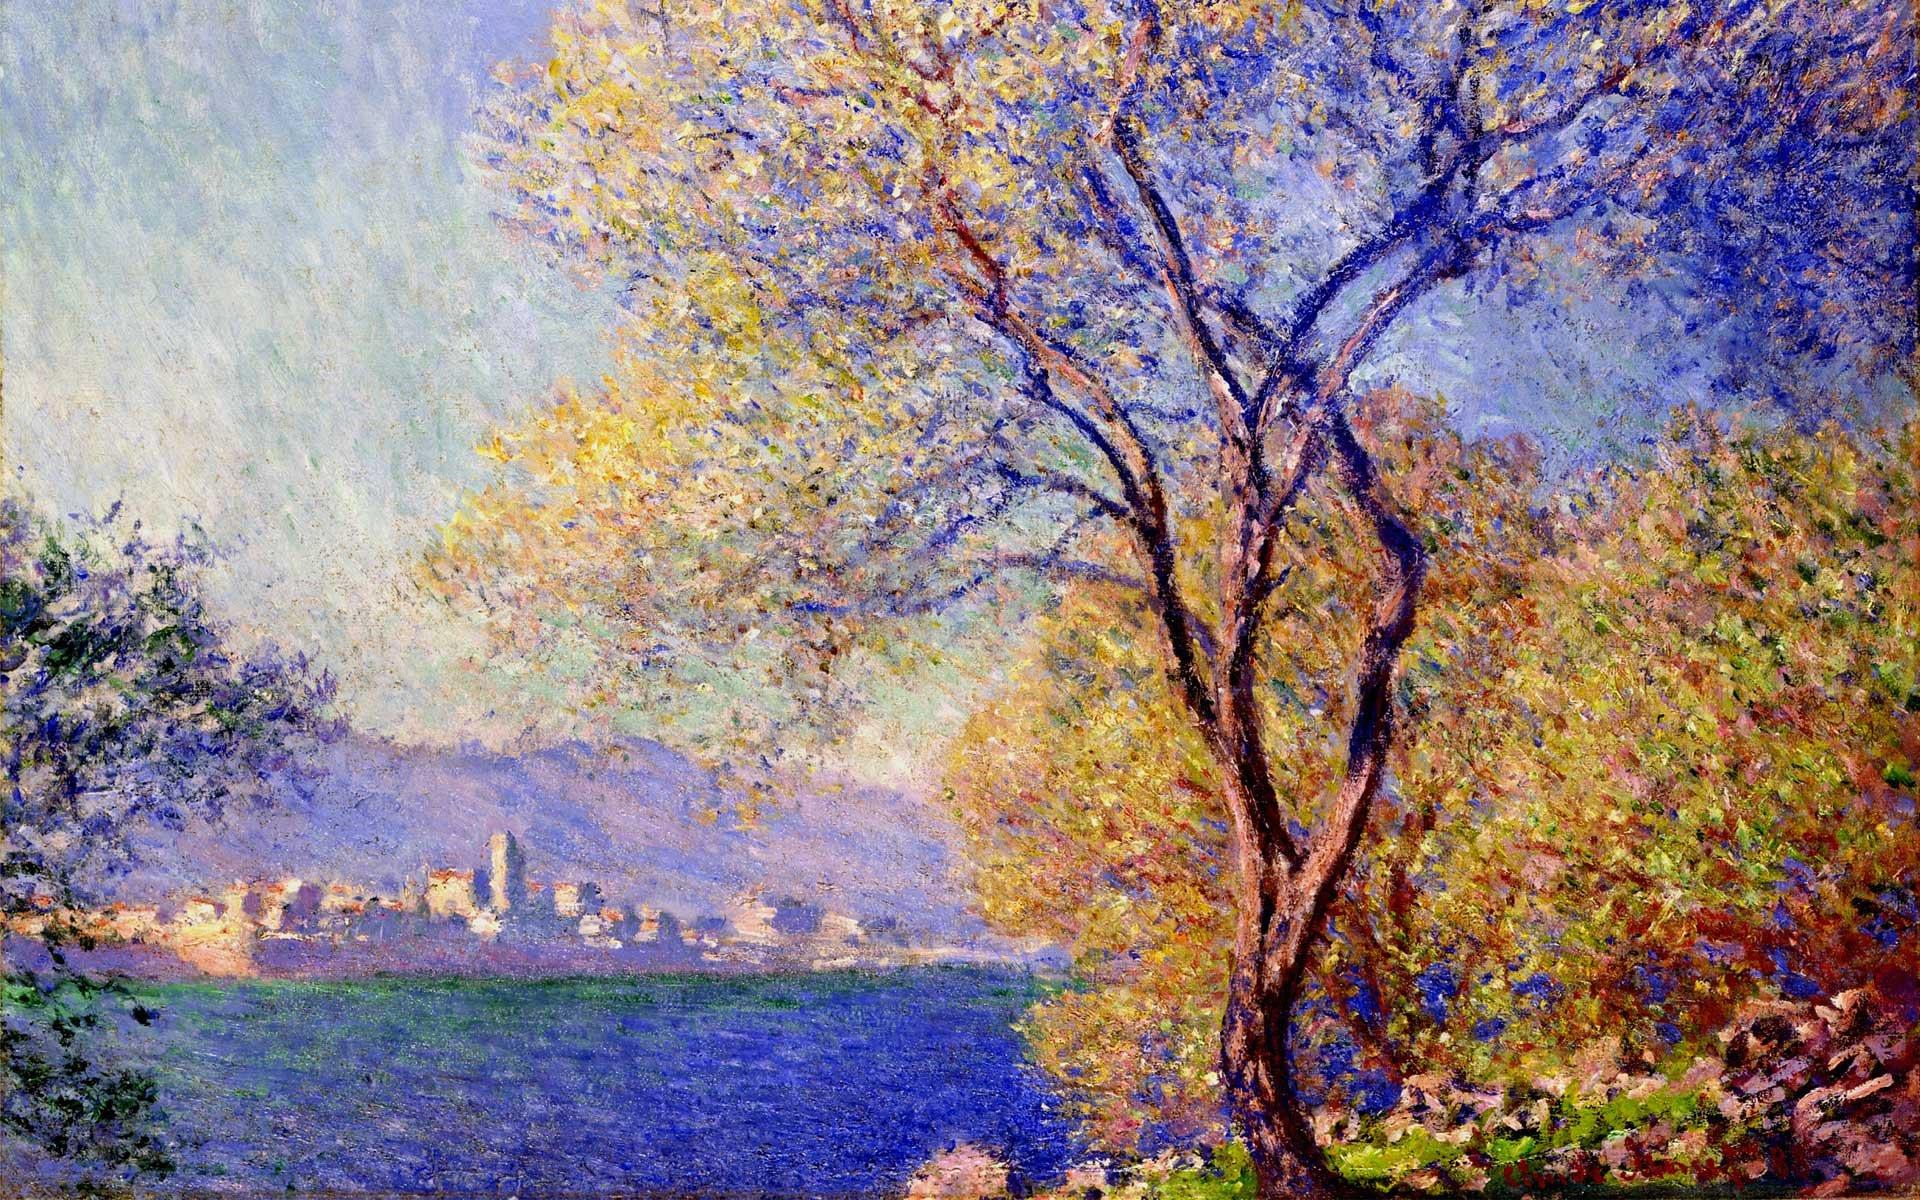 южные пейзажи < Антиб, вид из садов Салис >:: Клод Моне, описание картины - Моне Клод (Claude Monet) фото